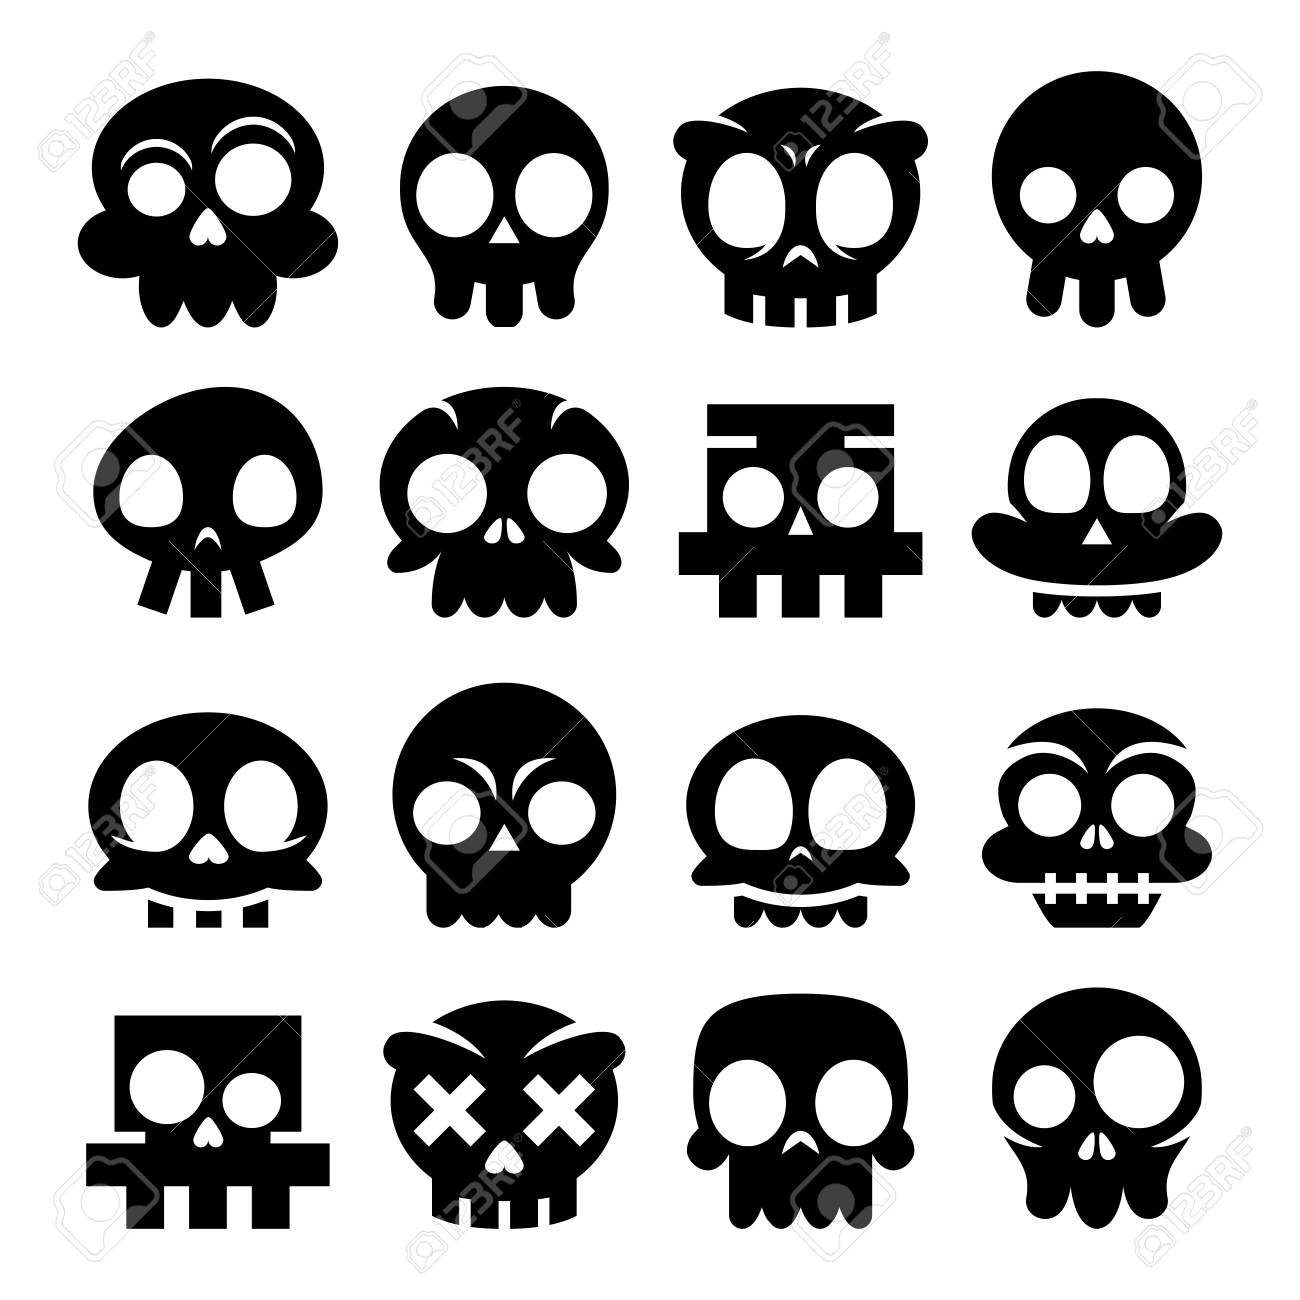 Iconos De Calavera De Dibujos Animados De Vector De Halloween